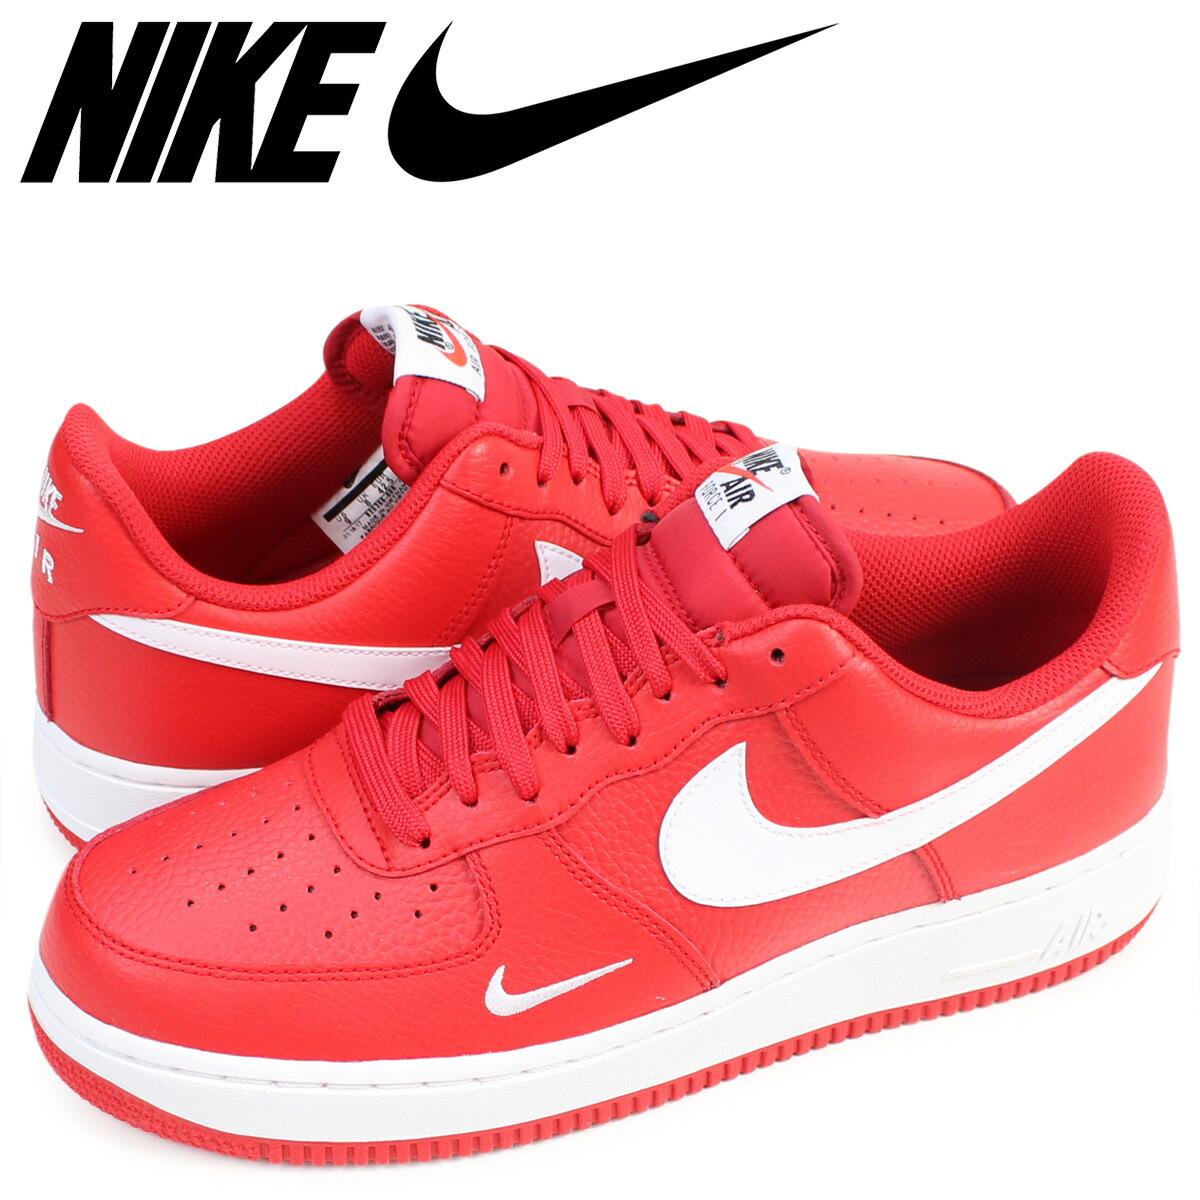 SneaK Online Shop  Nike NIKE air force 1 sneakers AIR FORCE 1 LOW 07 ... a640f9107